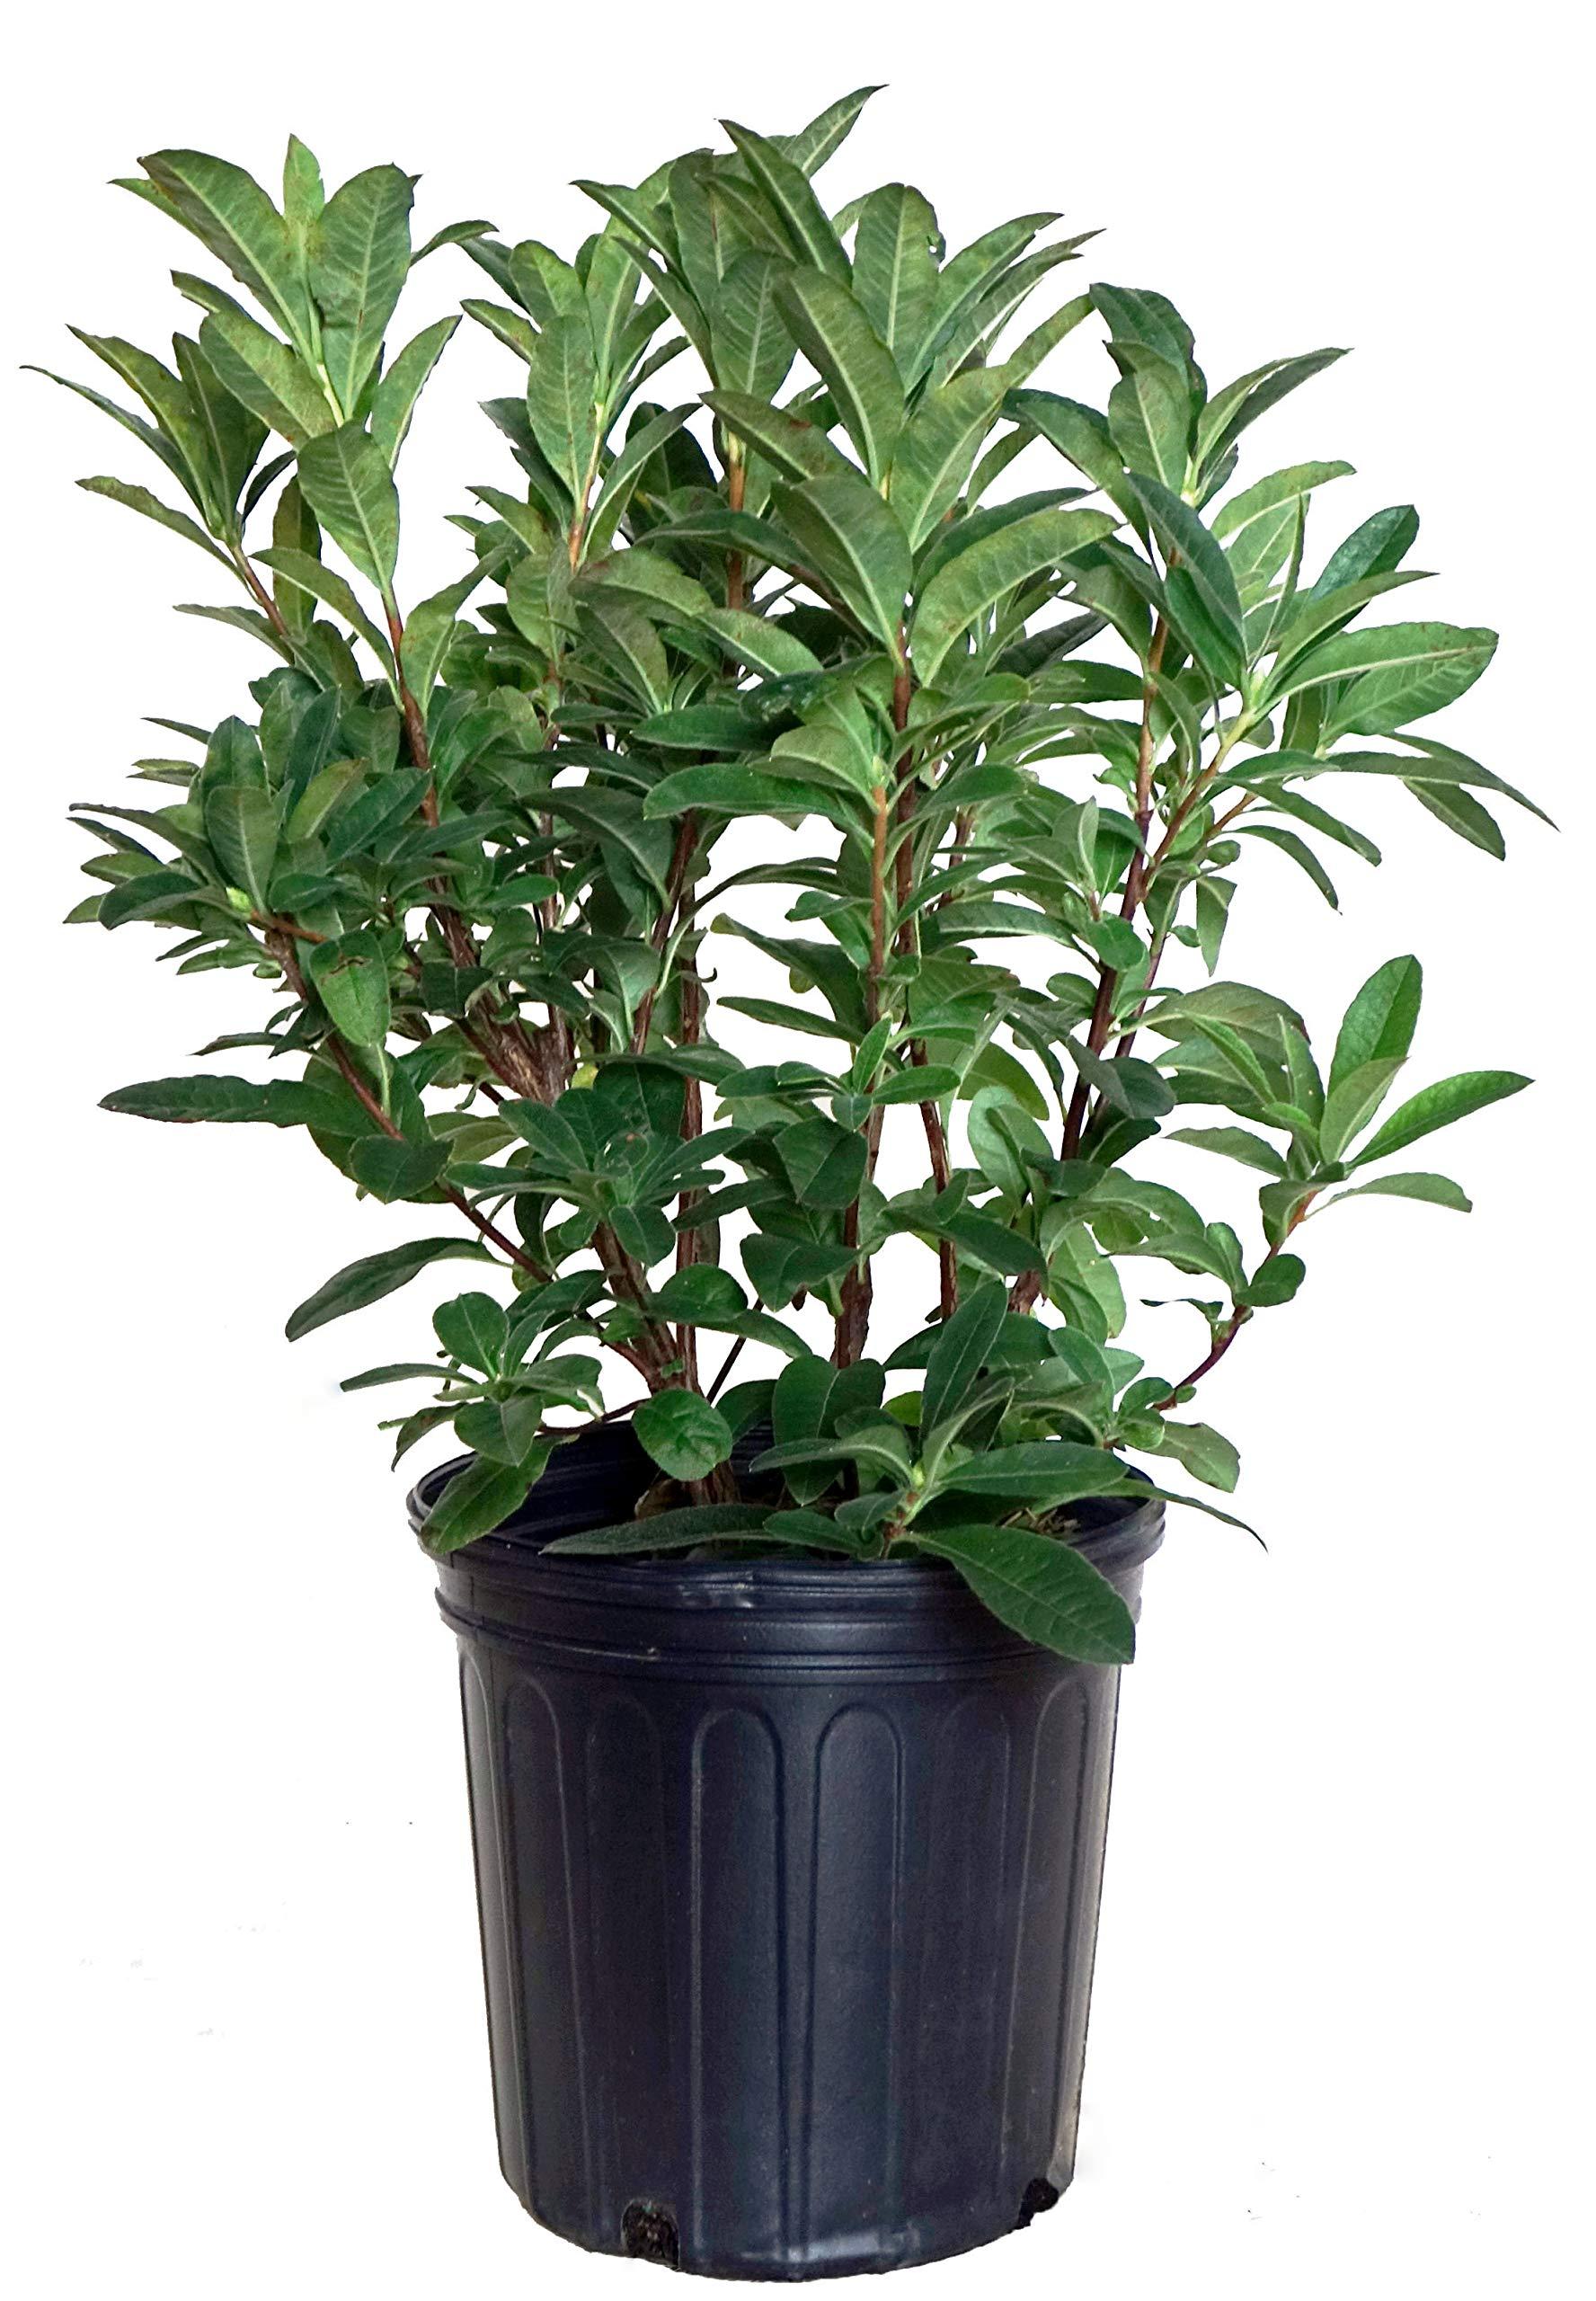 Azalea 'Mandarin Lights' (Exbury hybrid) Shrub, orange flowers, #2 - Size Container